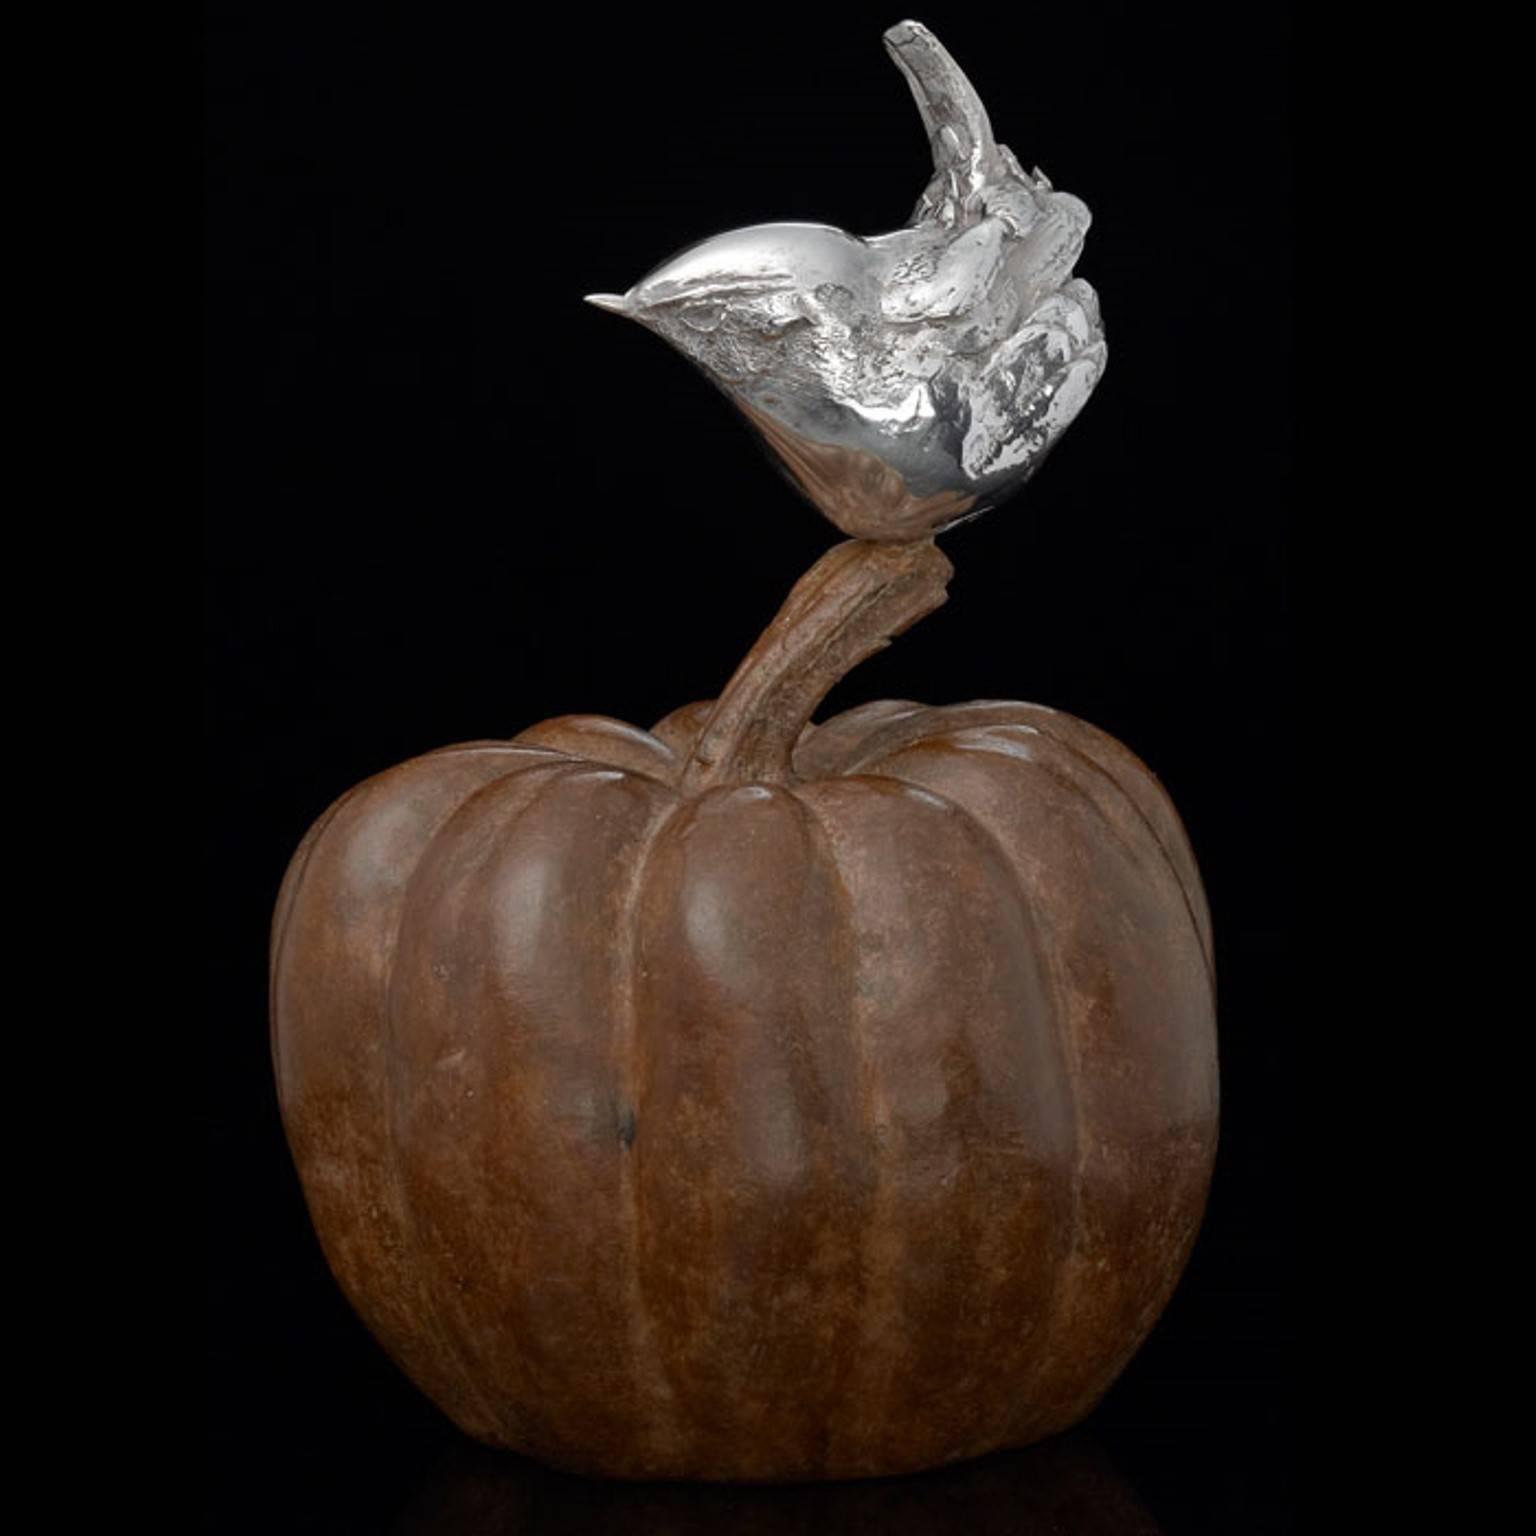 'Wren on a Pumpkin' Silver & Bronze Limited Edition Sculpture by Ian Bowles